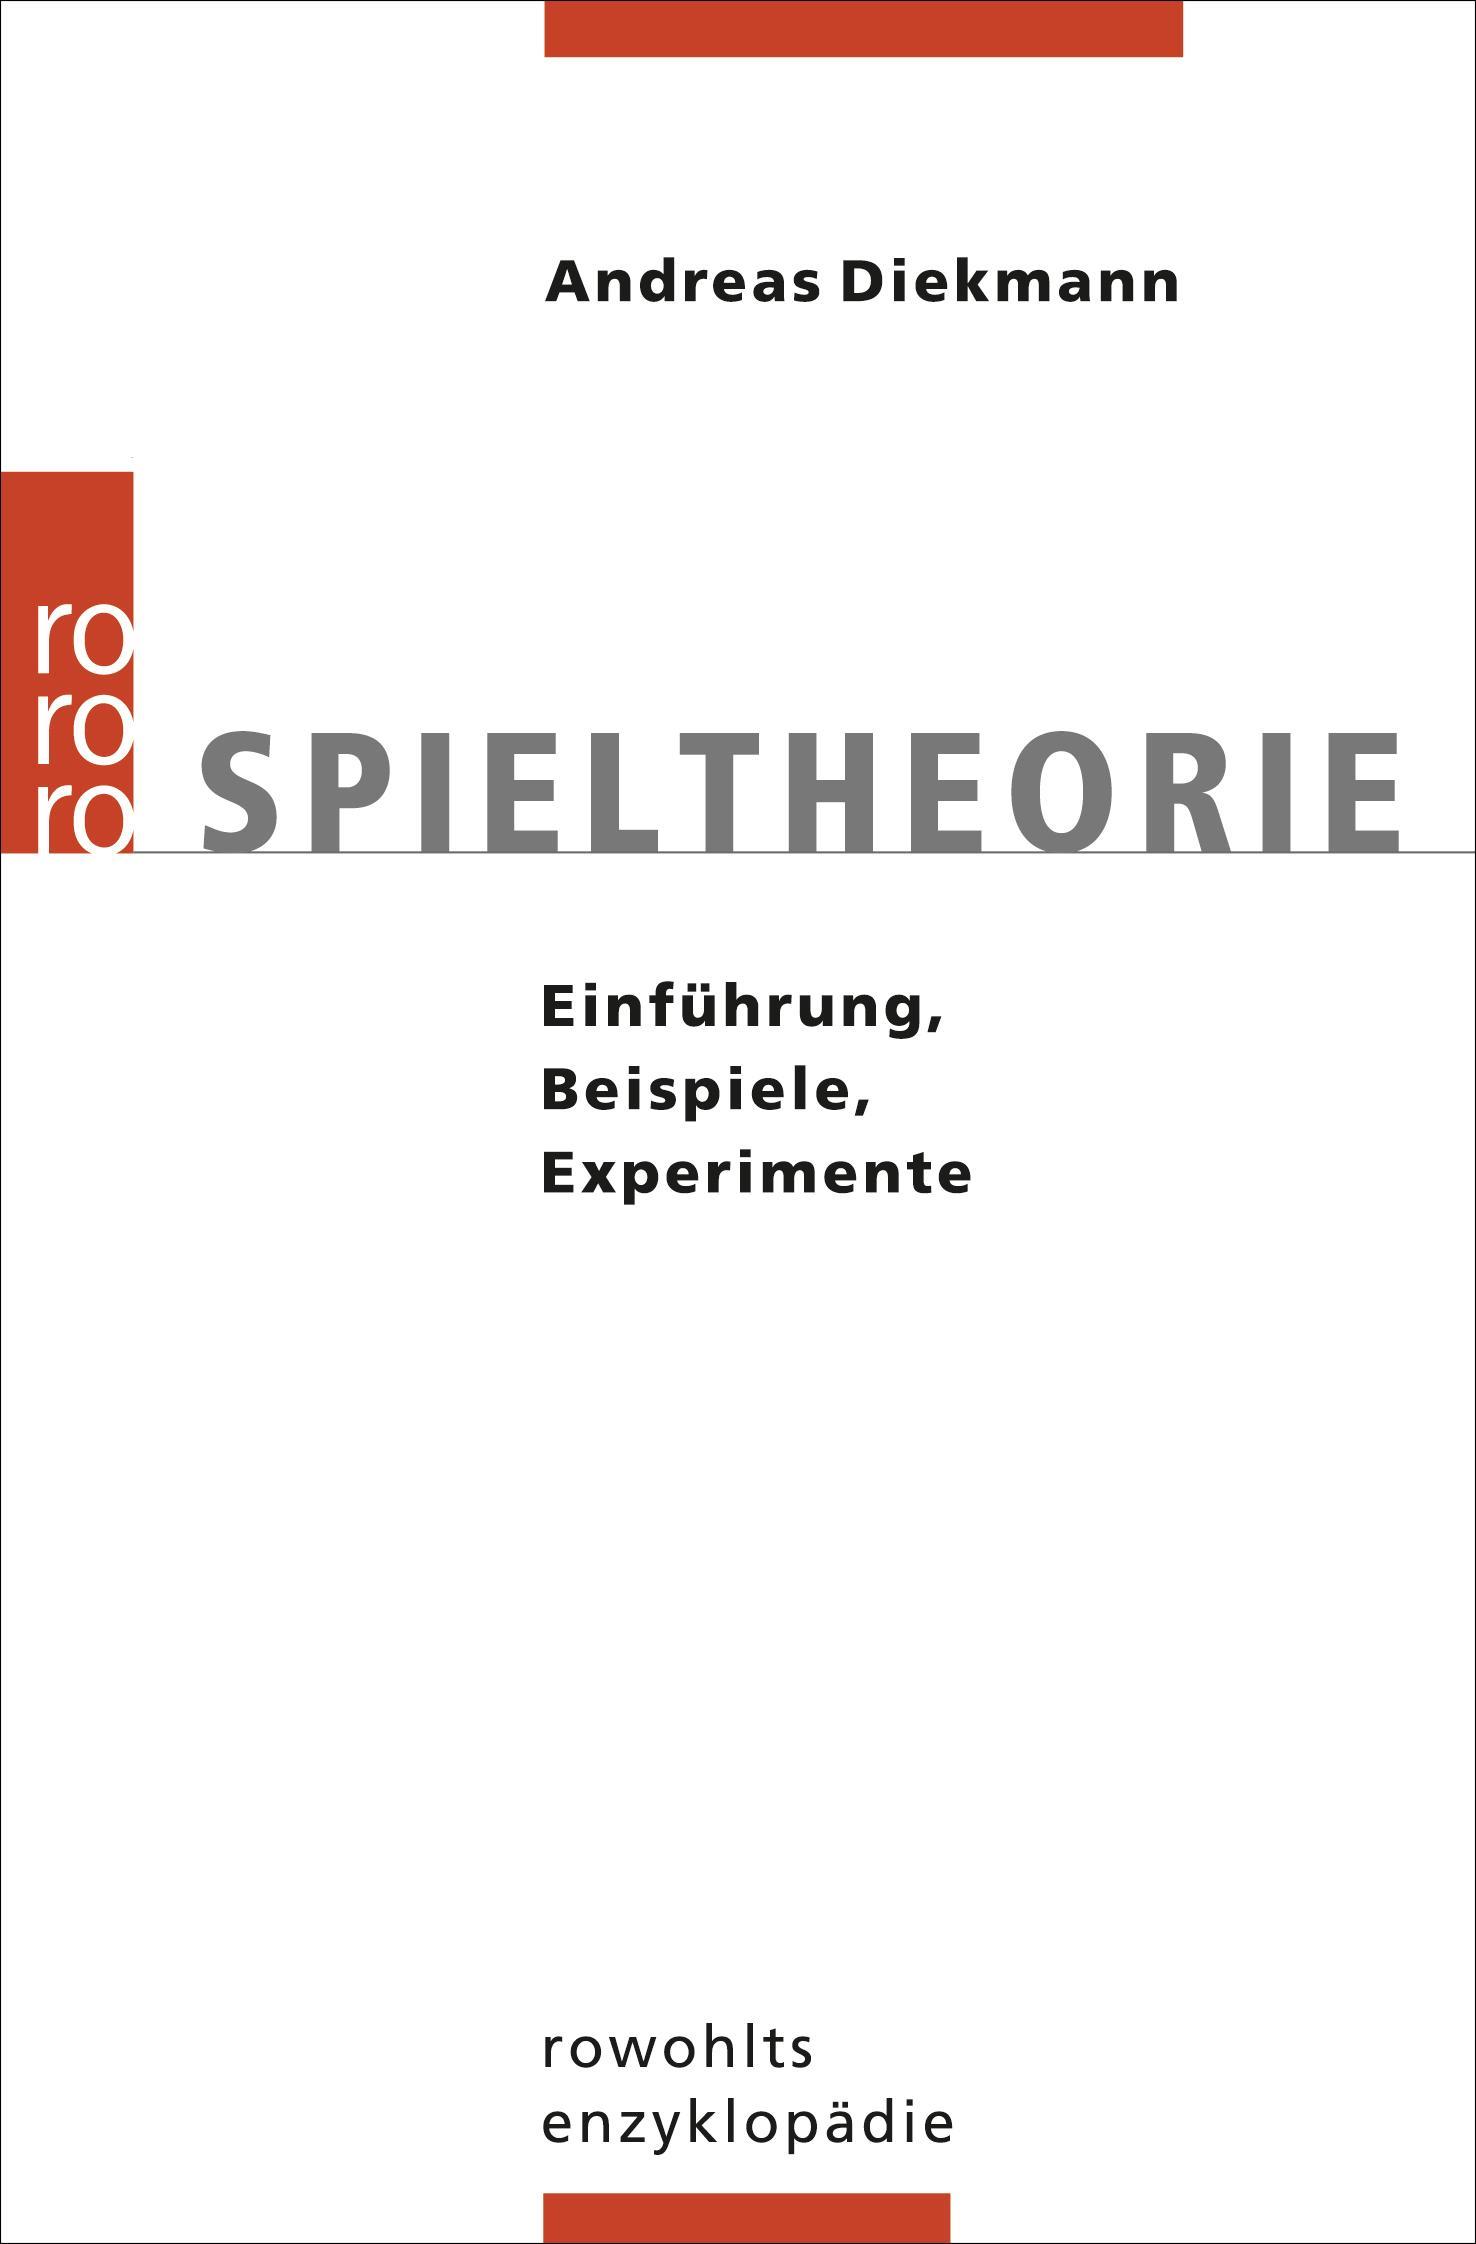 Andreas Diekmann , Spieltheorie ,  9783499557019